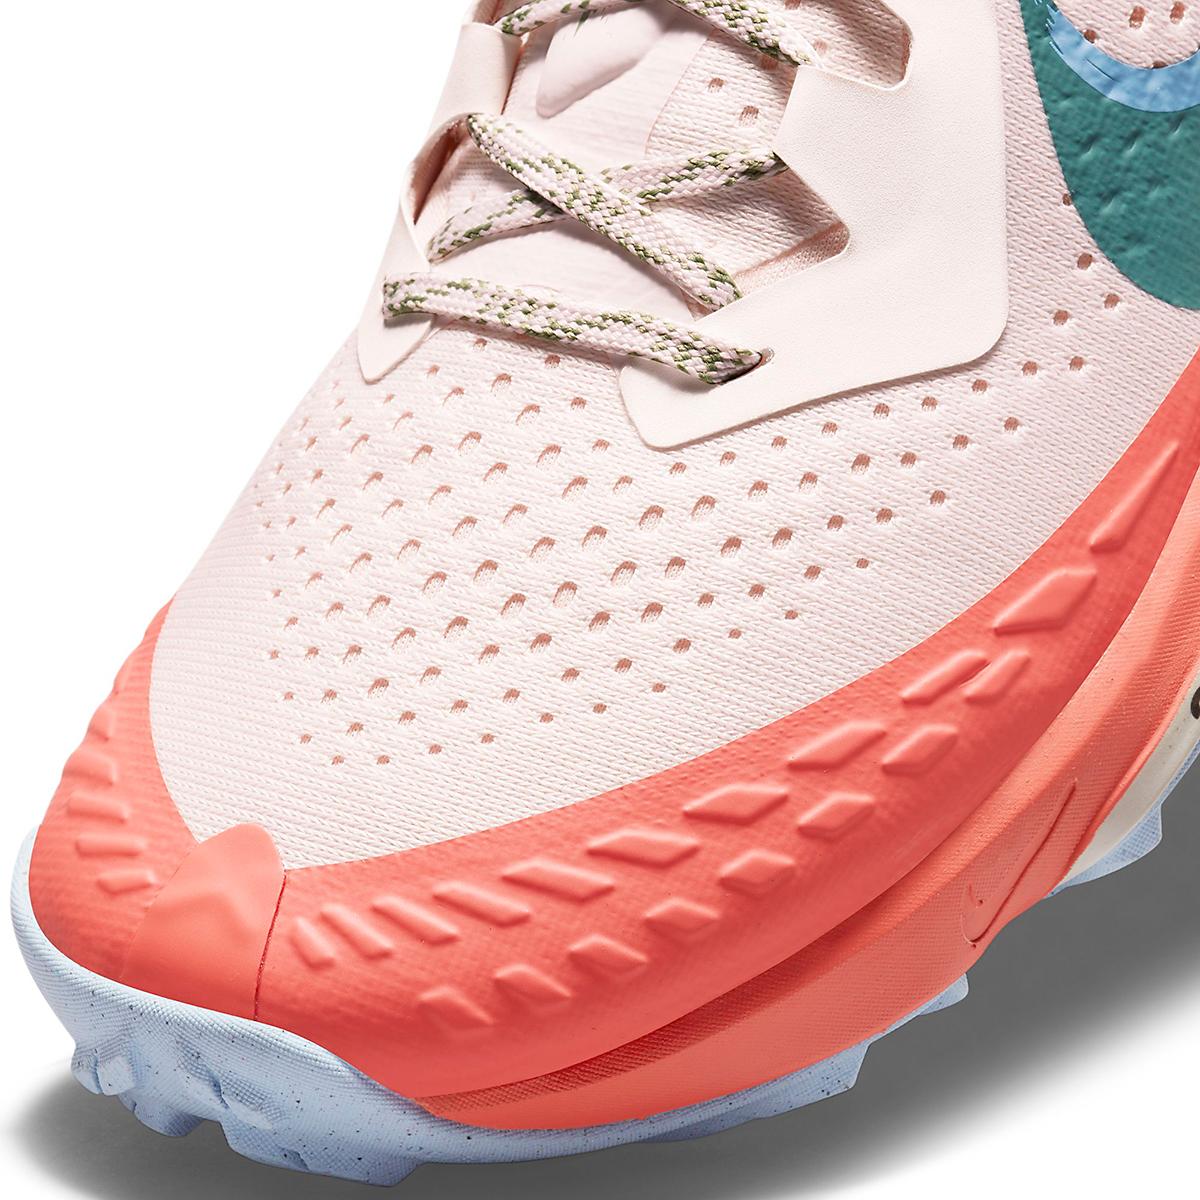 Women's Nike Air Zoom Terra Kiger 7 Trail Running Shoe - Color: Light Soft Pink/Bicoastal/Magic Ember - Size: 5 - Width: Regular, Light Soft Pink/Bicoastal/Magic Ember, large, image 6